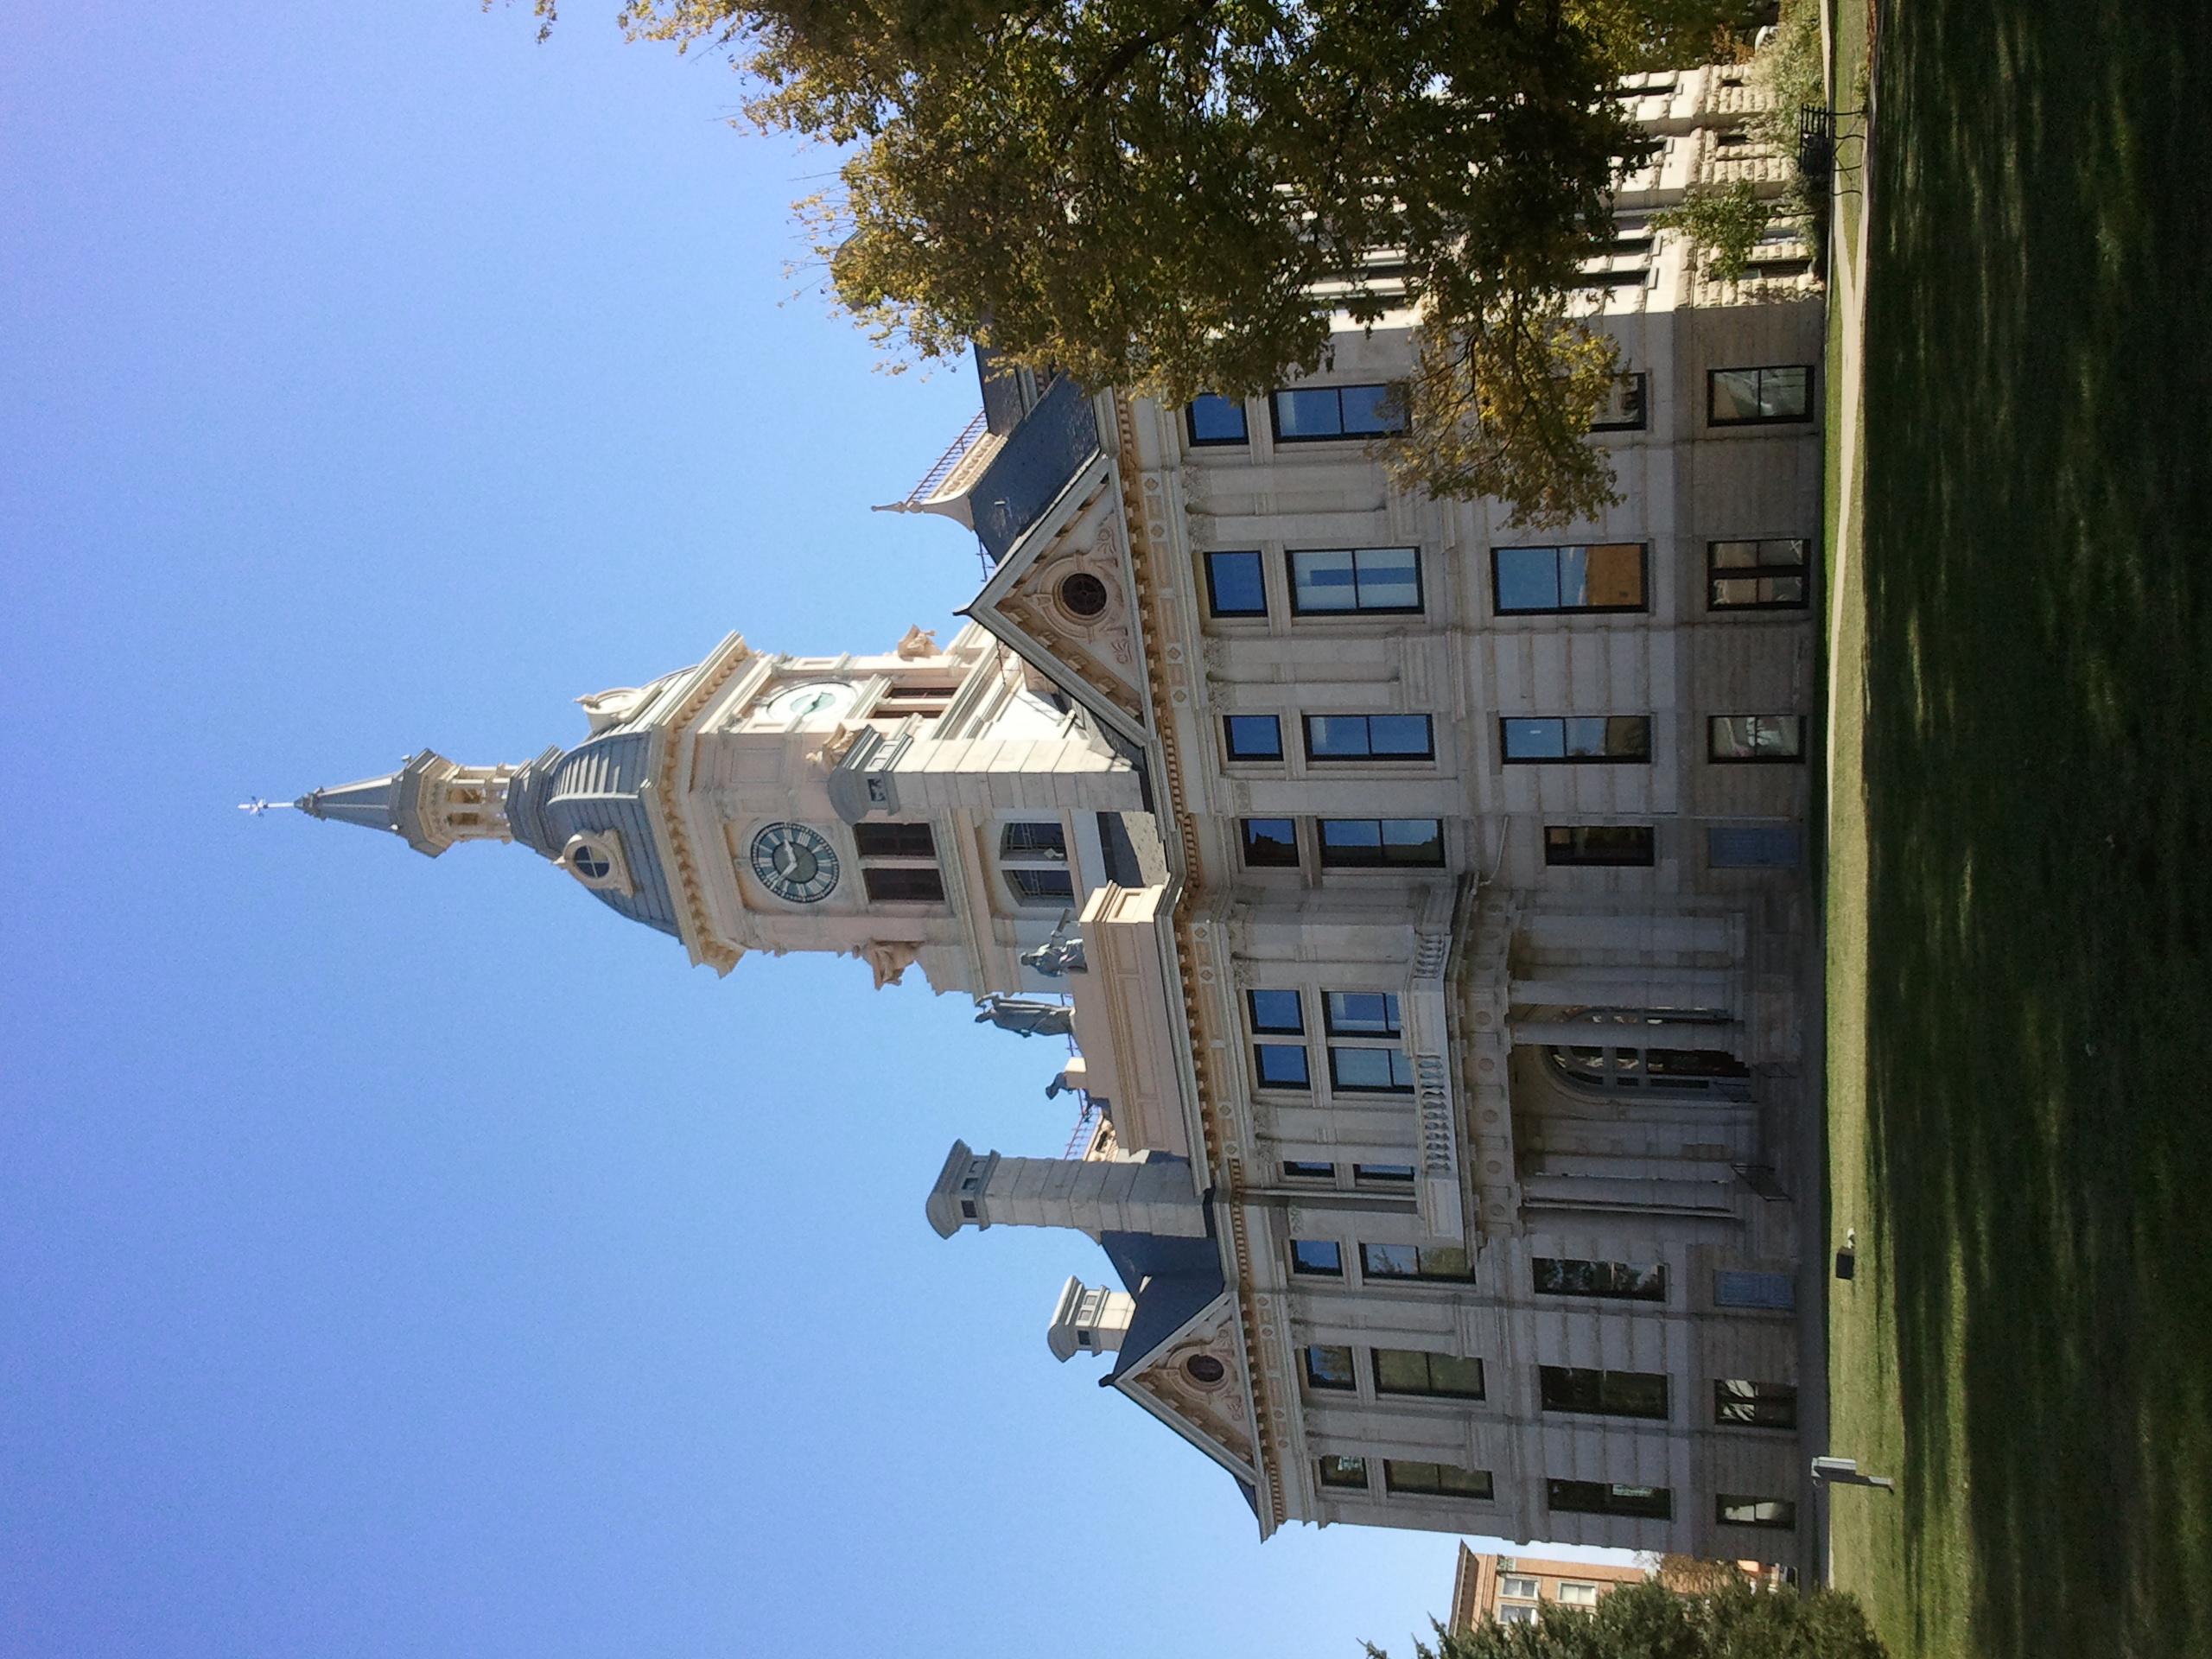 File:Marshall County Courthouse, Marshalltown, Iowa 10.jpgbalance of marshall county